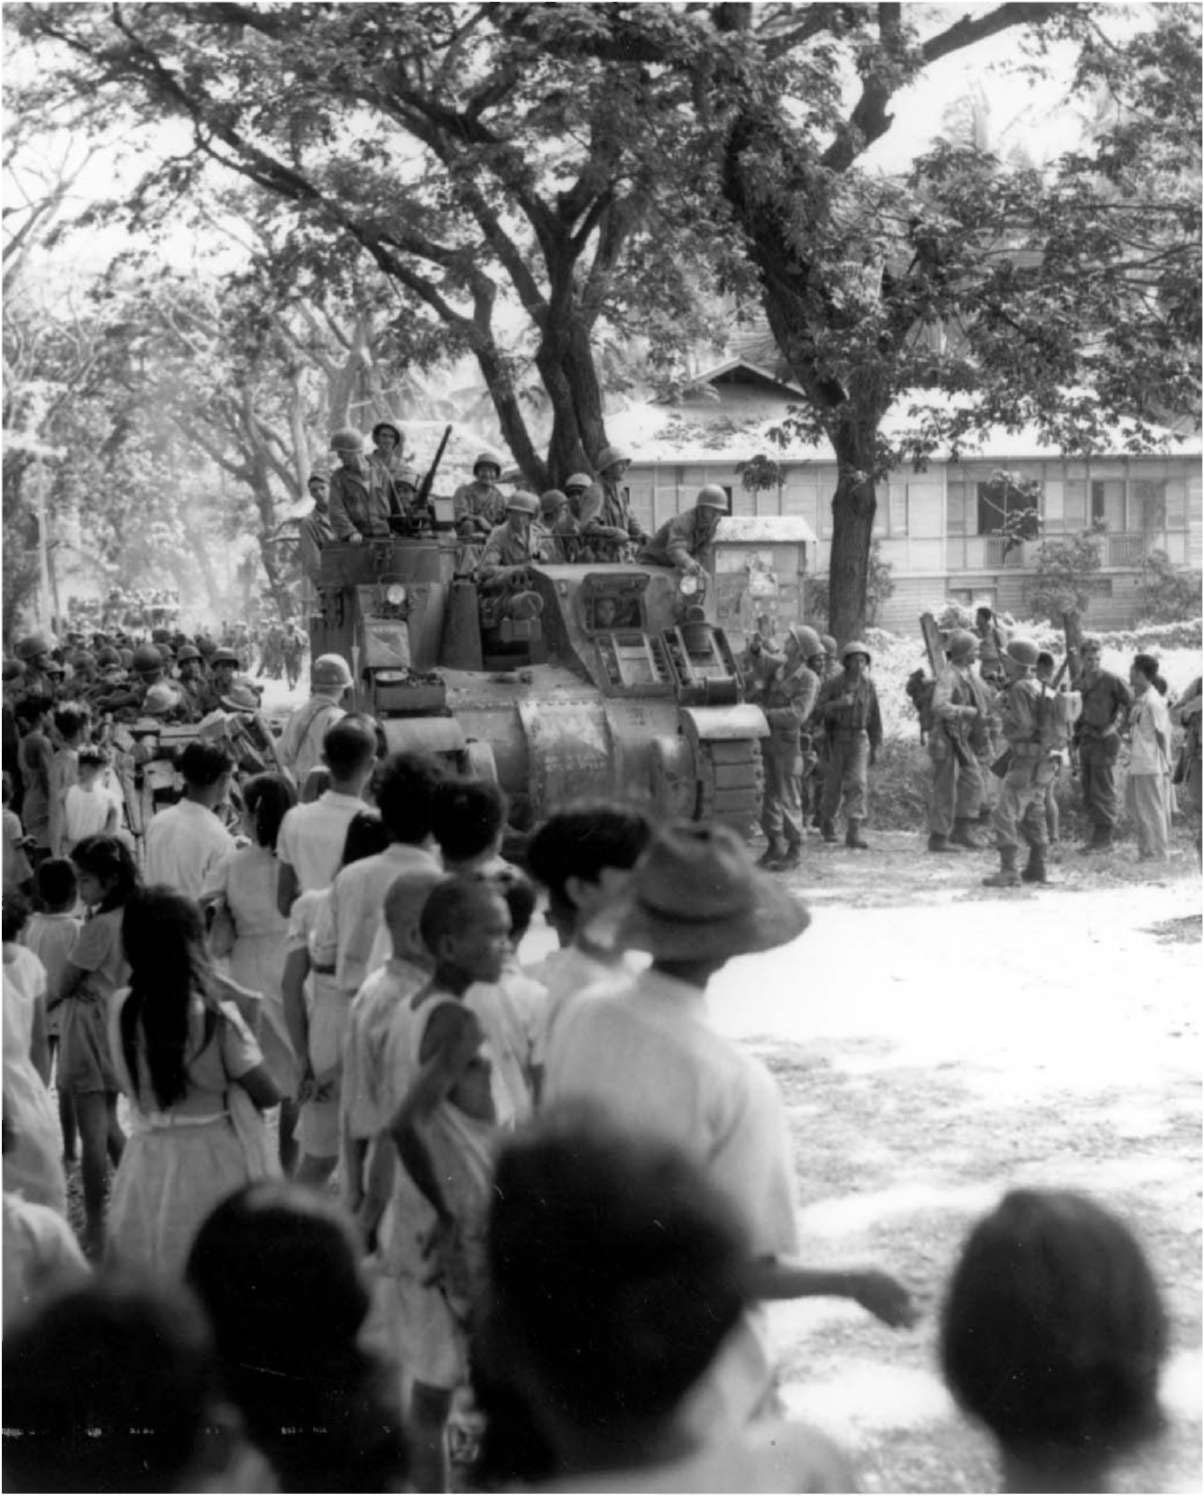 M7 liberating Cebu island, Philippines, 1945